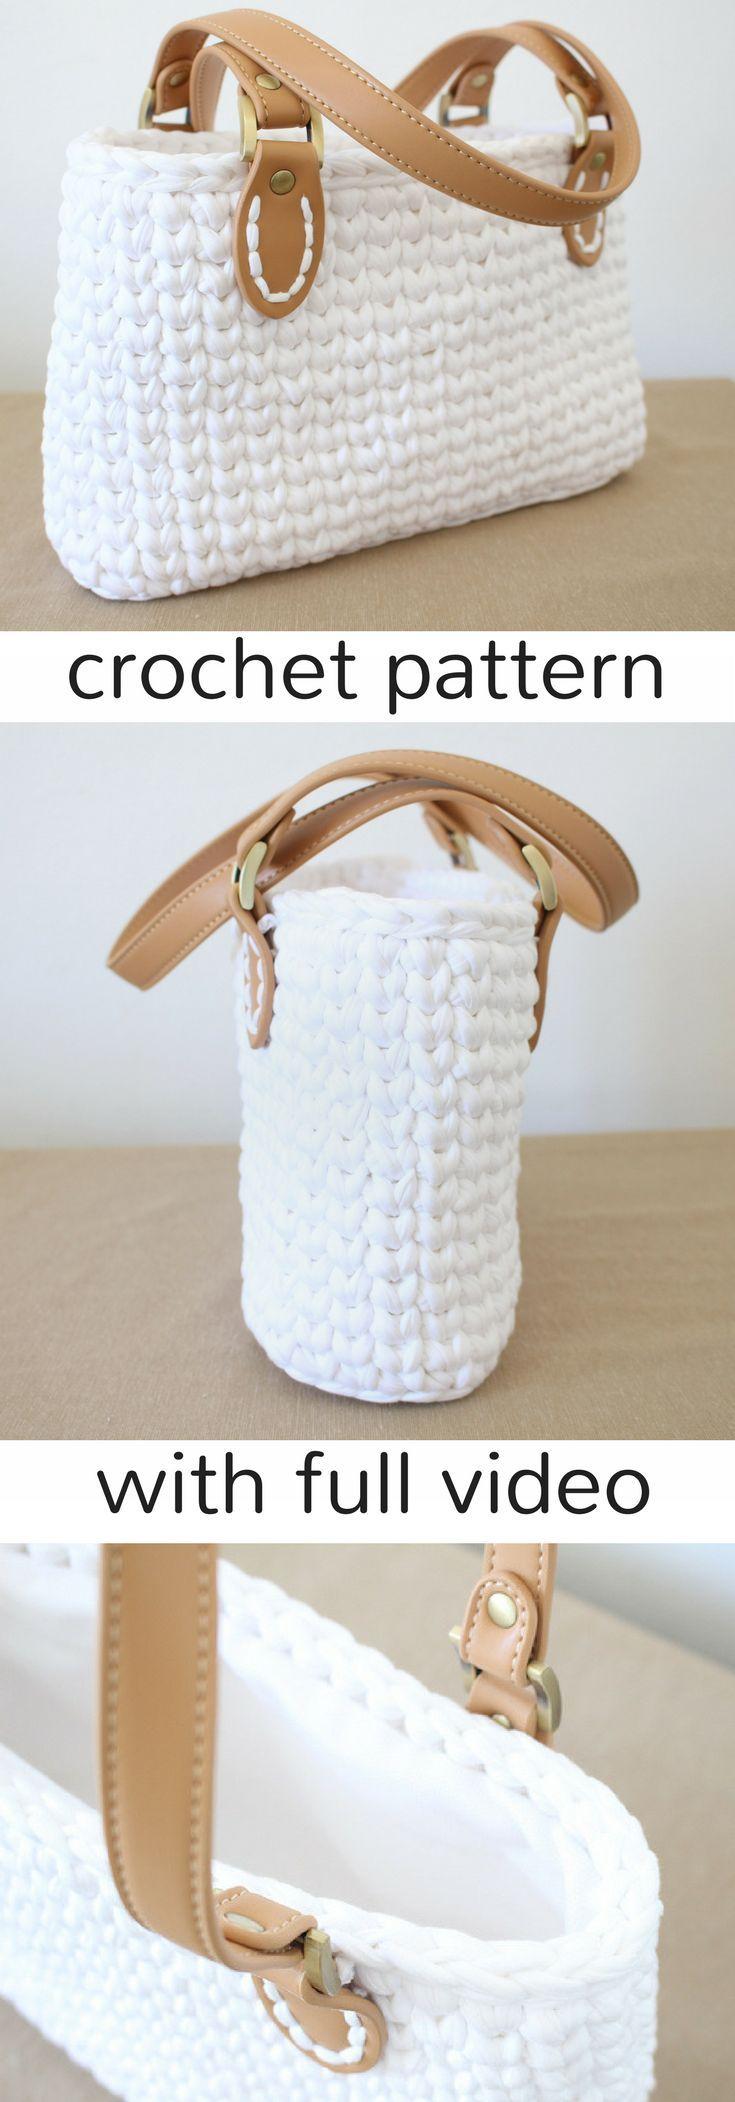 Handbag pattern by Jessica Venture - Crochet and Knitting Patterns #crochethandbags